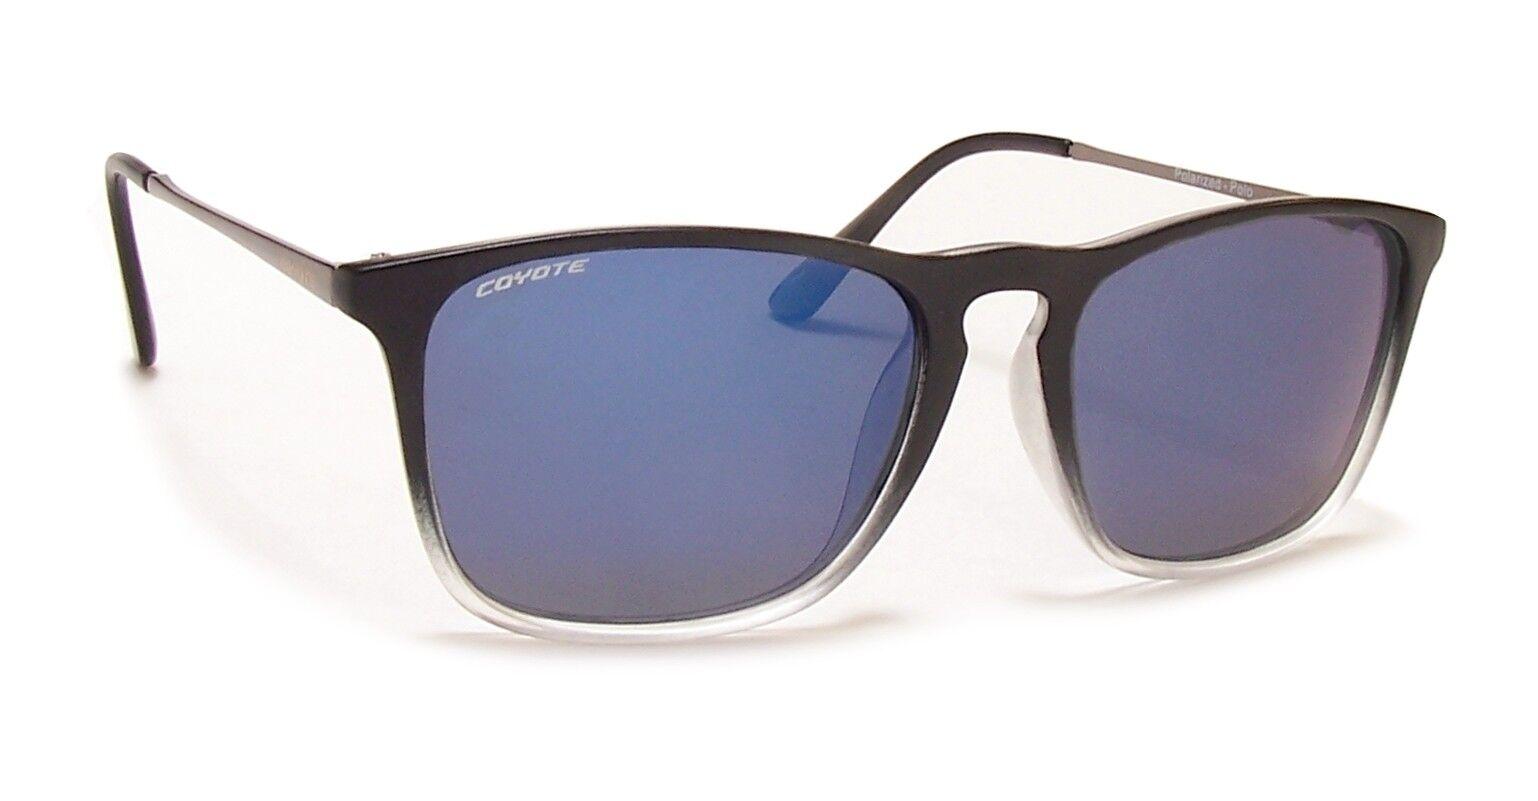 aadaaea6e2f Coyote Eyewear Polo Polarized Streetstyle Sunglasses Polo-blk for ...